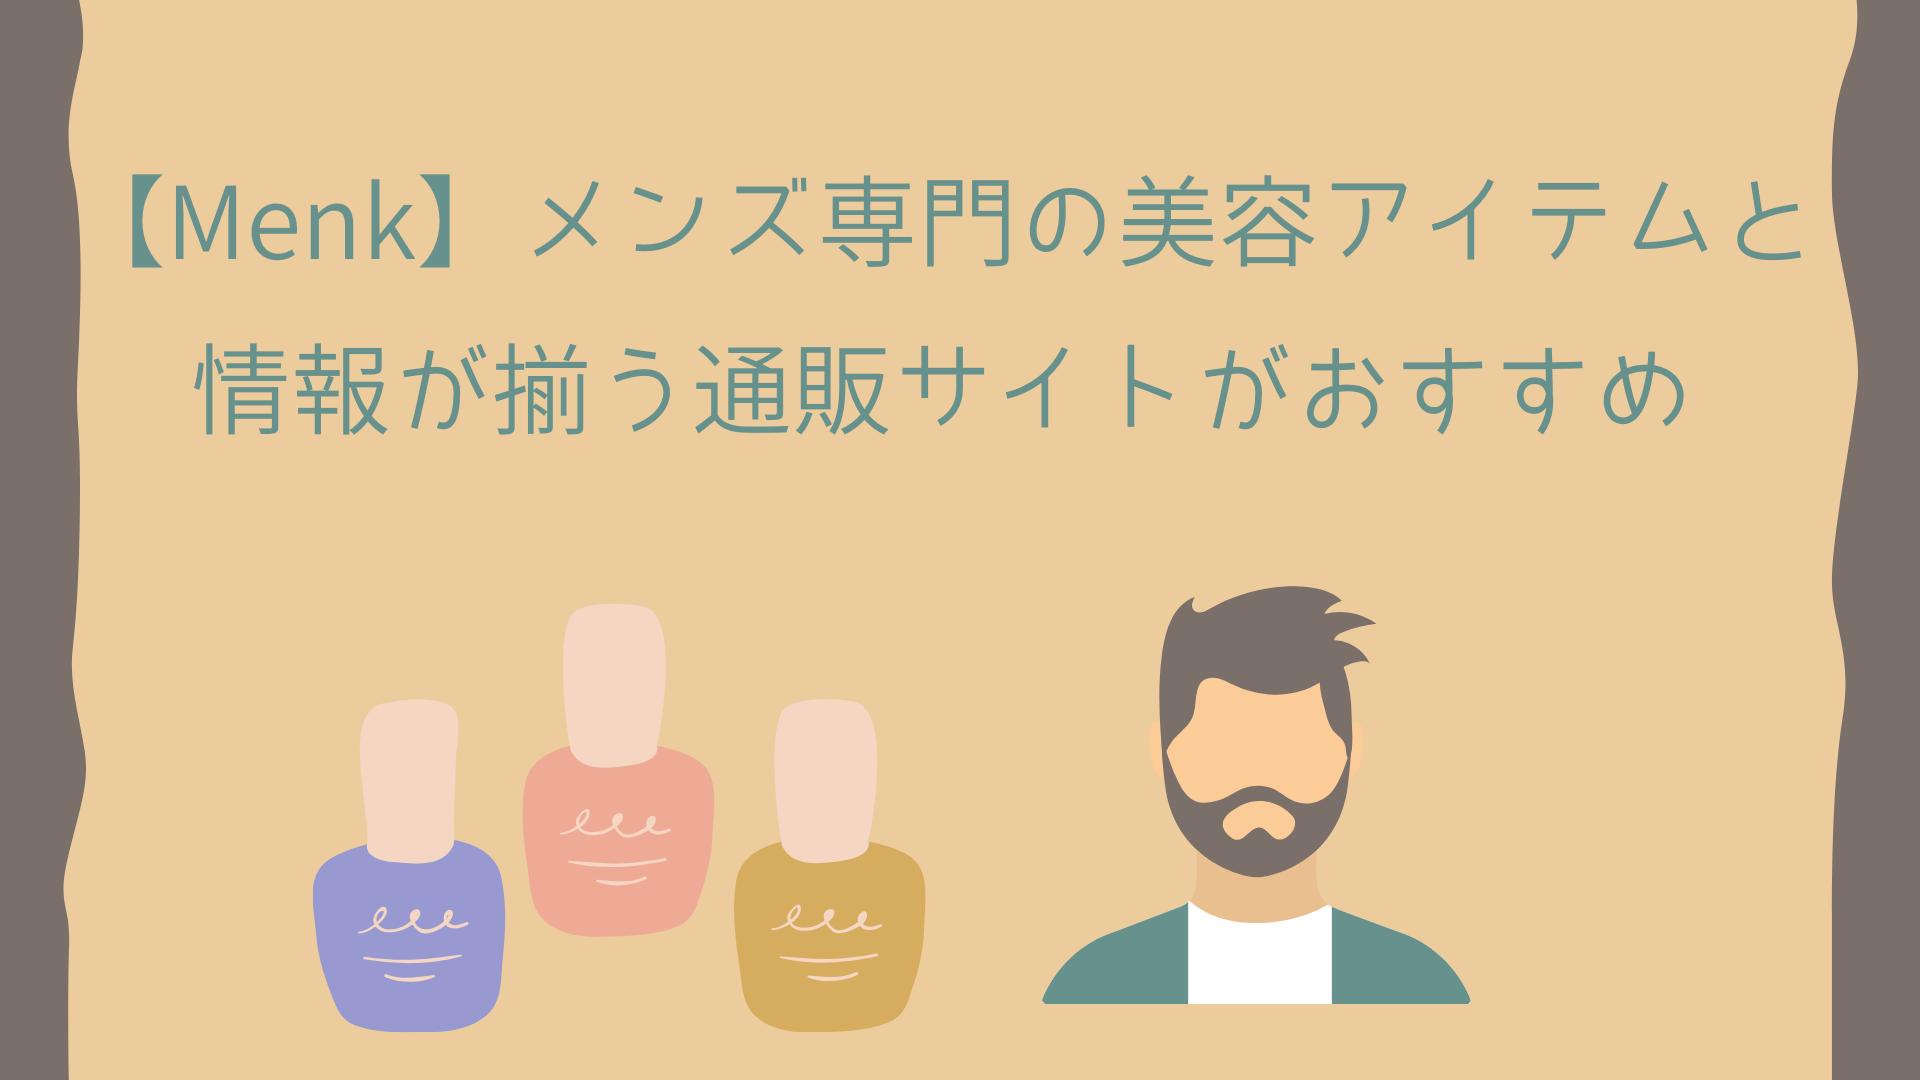 menk紹介記事